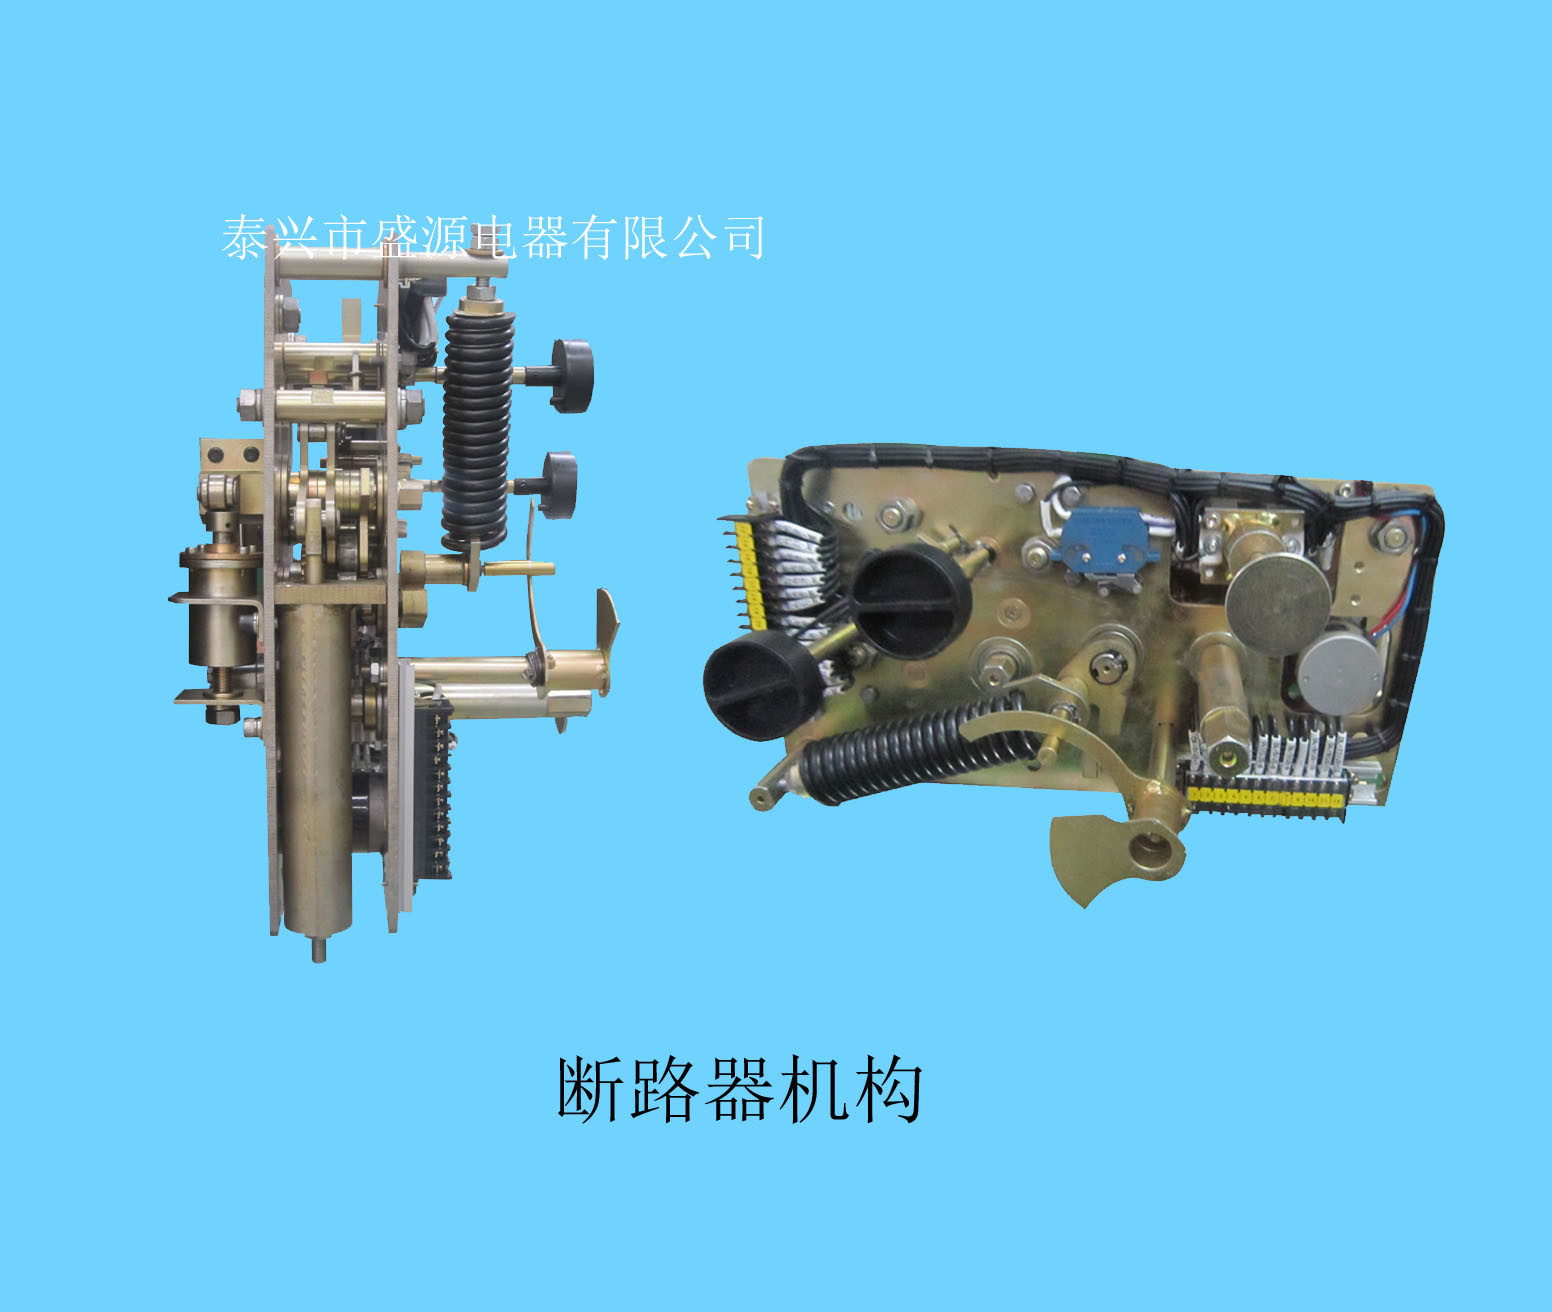 Outdoor Circuit Breaker for High Pressure Cabinet